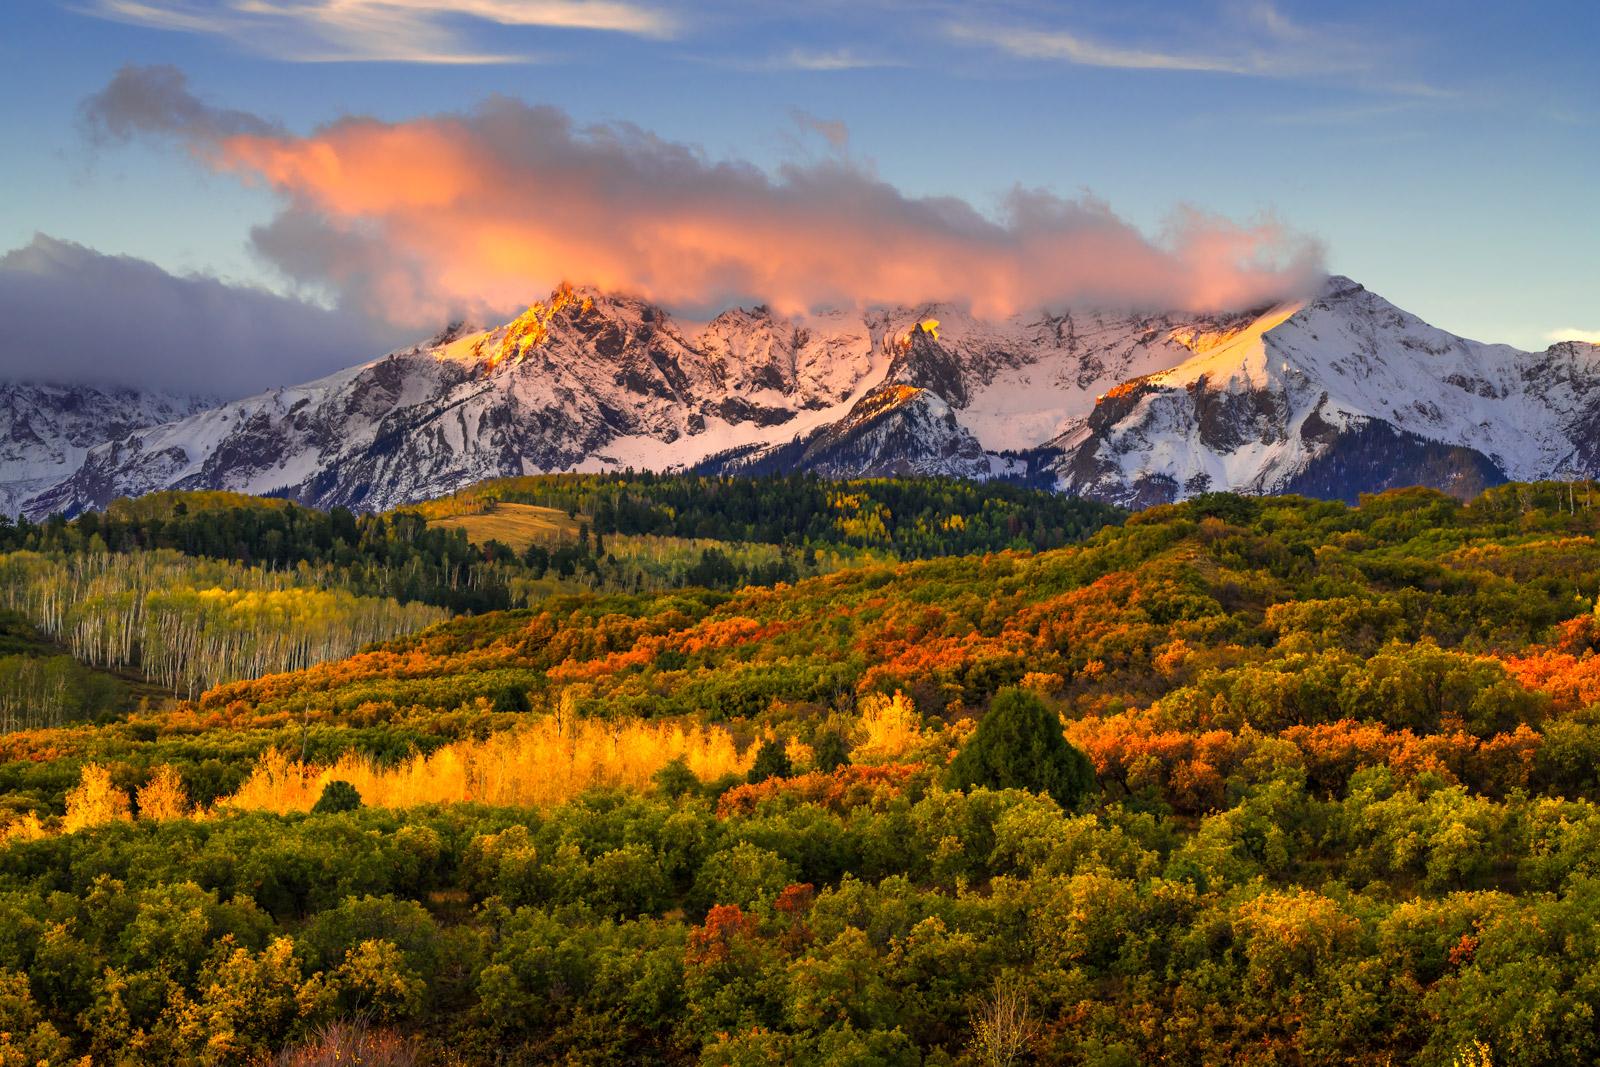 Colorado, San Juan, Mountains, Fall, Color, Sunrise, Dallas Divide, limited edition, photograph, southwest colorado, fine art, landscape, fall color, photo